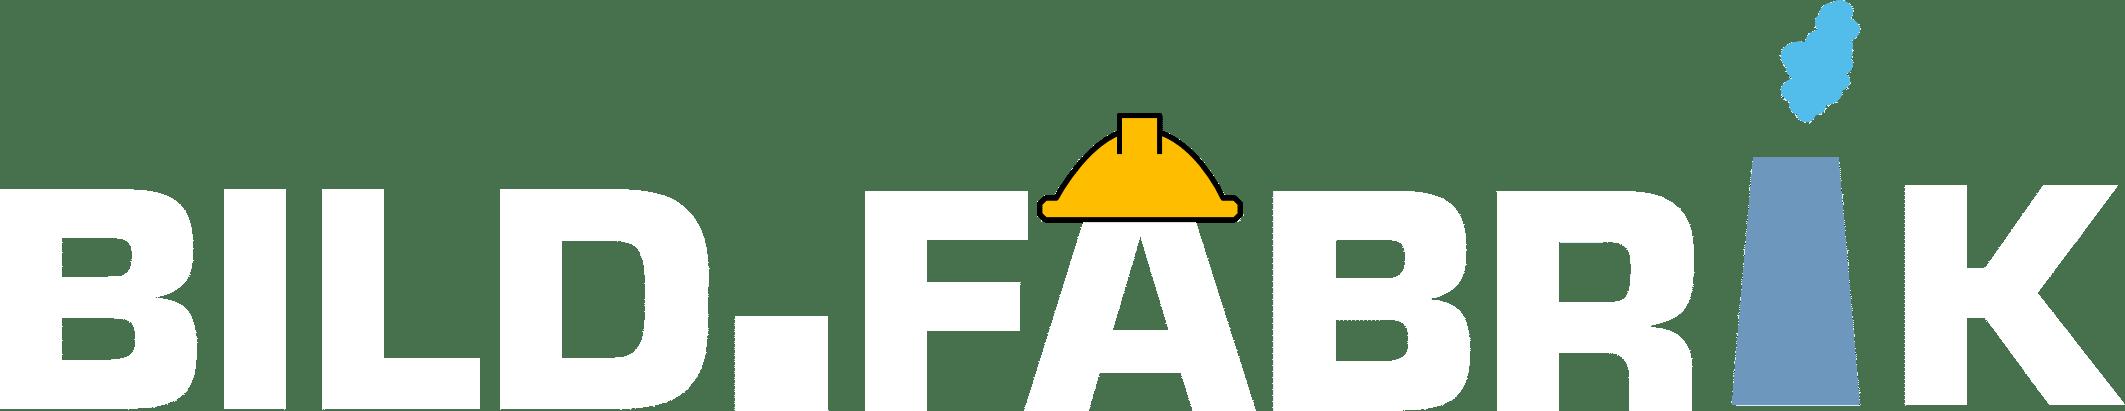 Logo der Webseite bildpunktfabrik.de